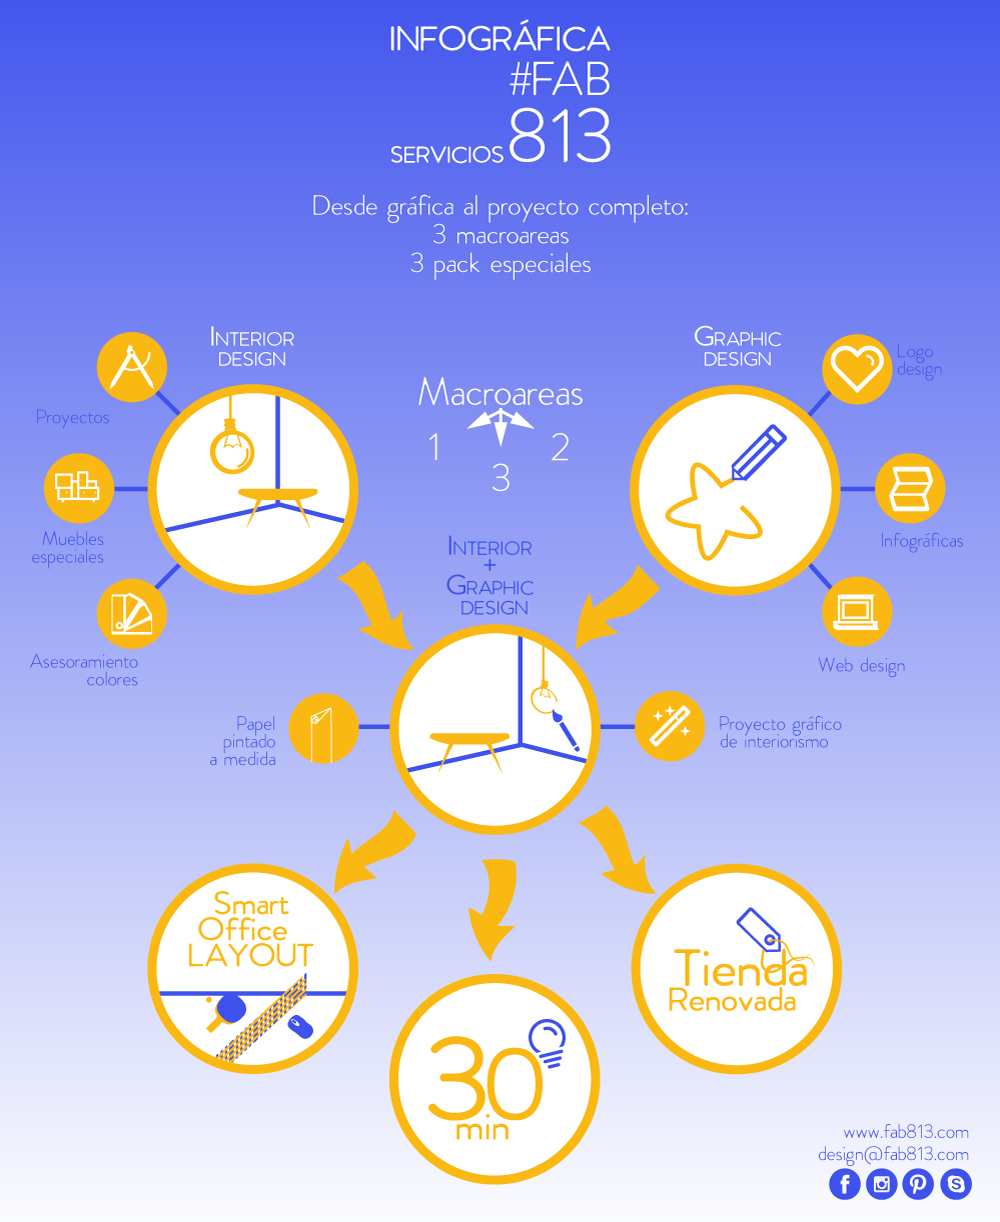 infografica fab813, servizi fab813